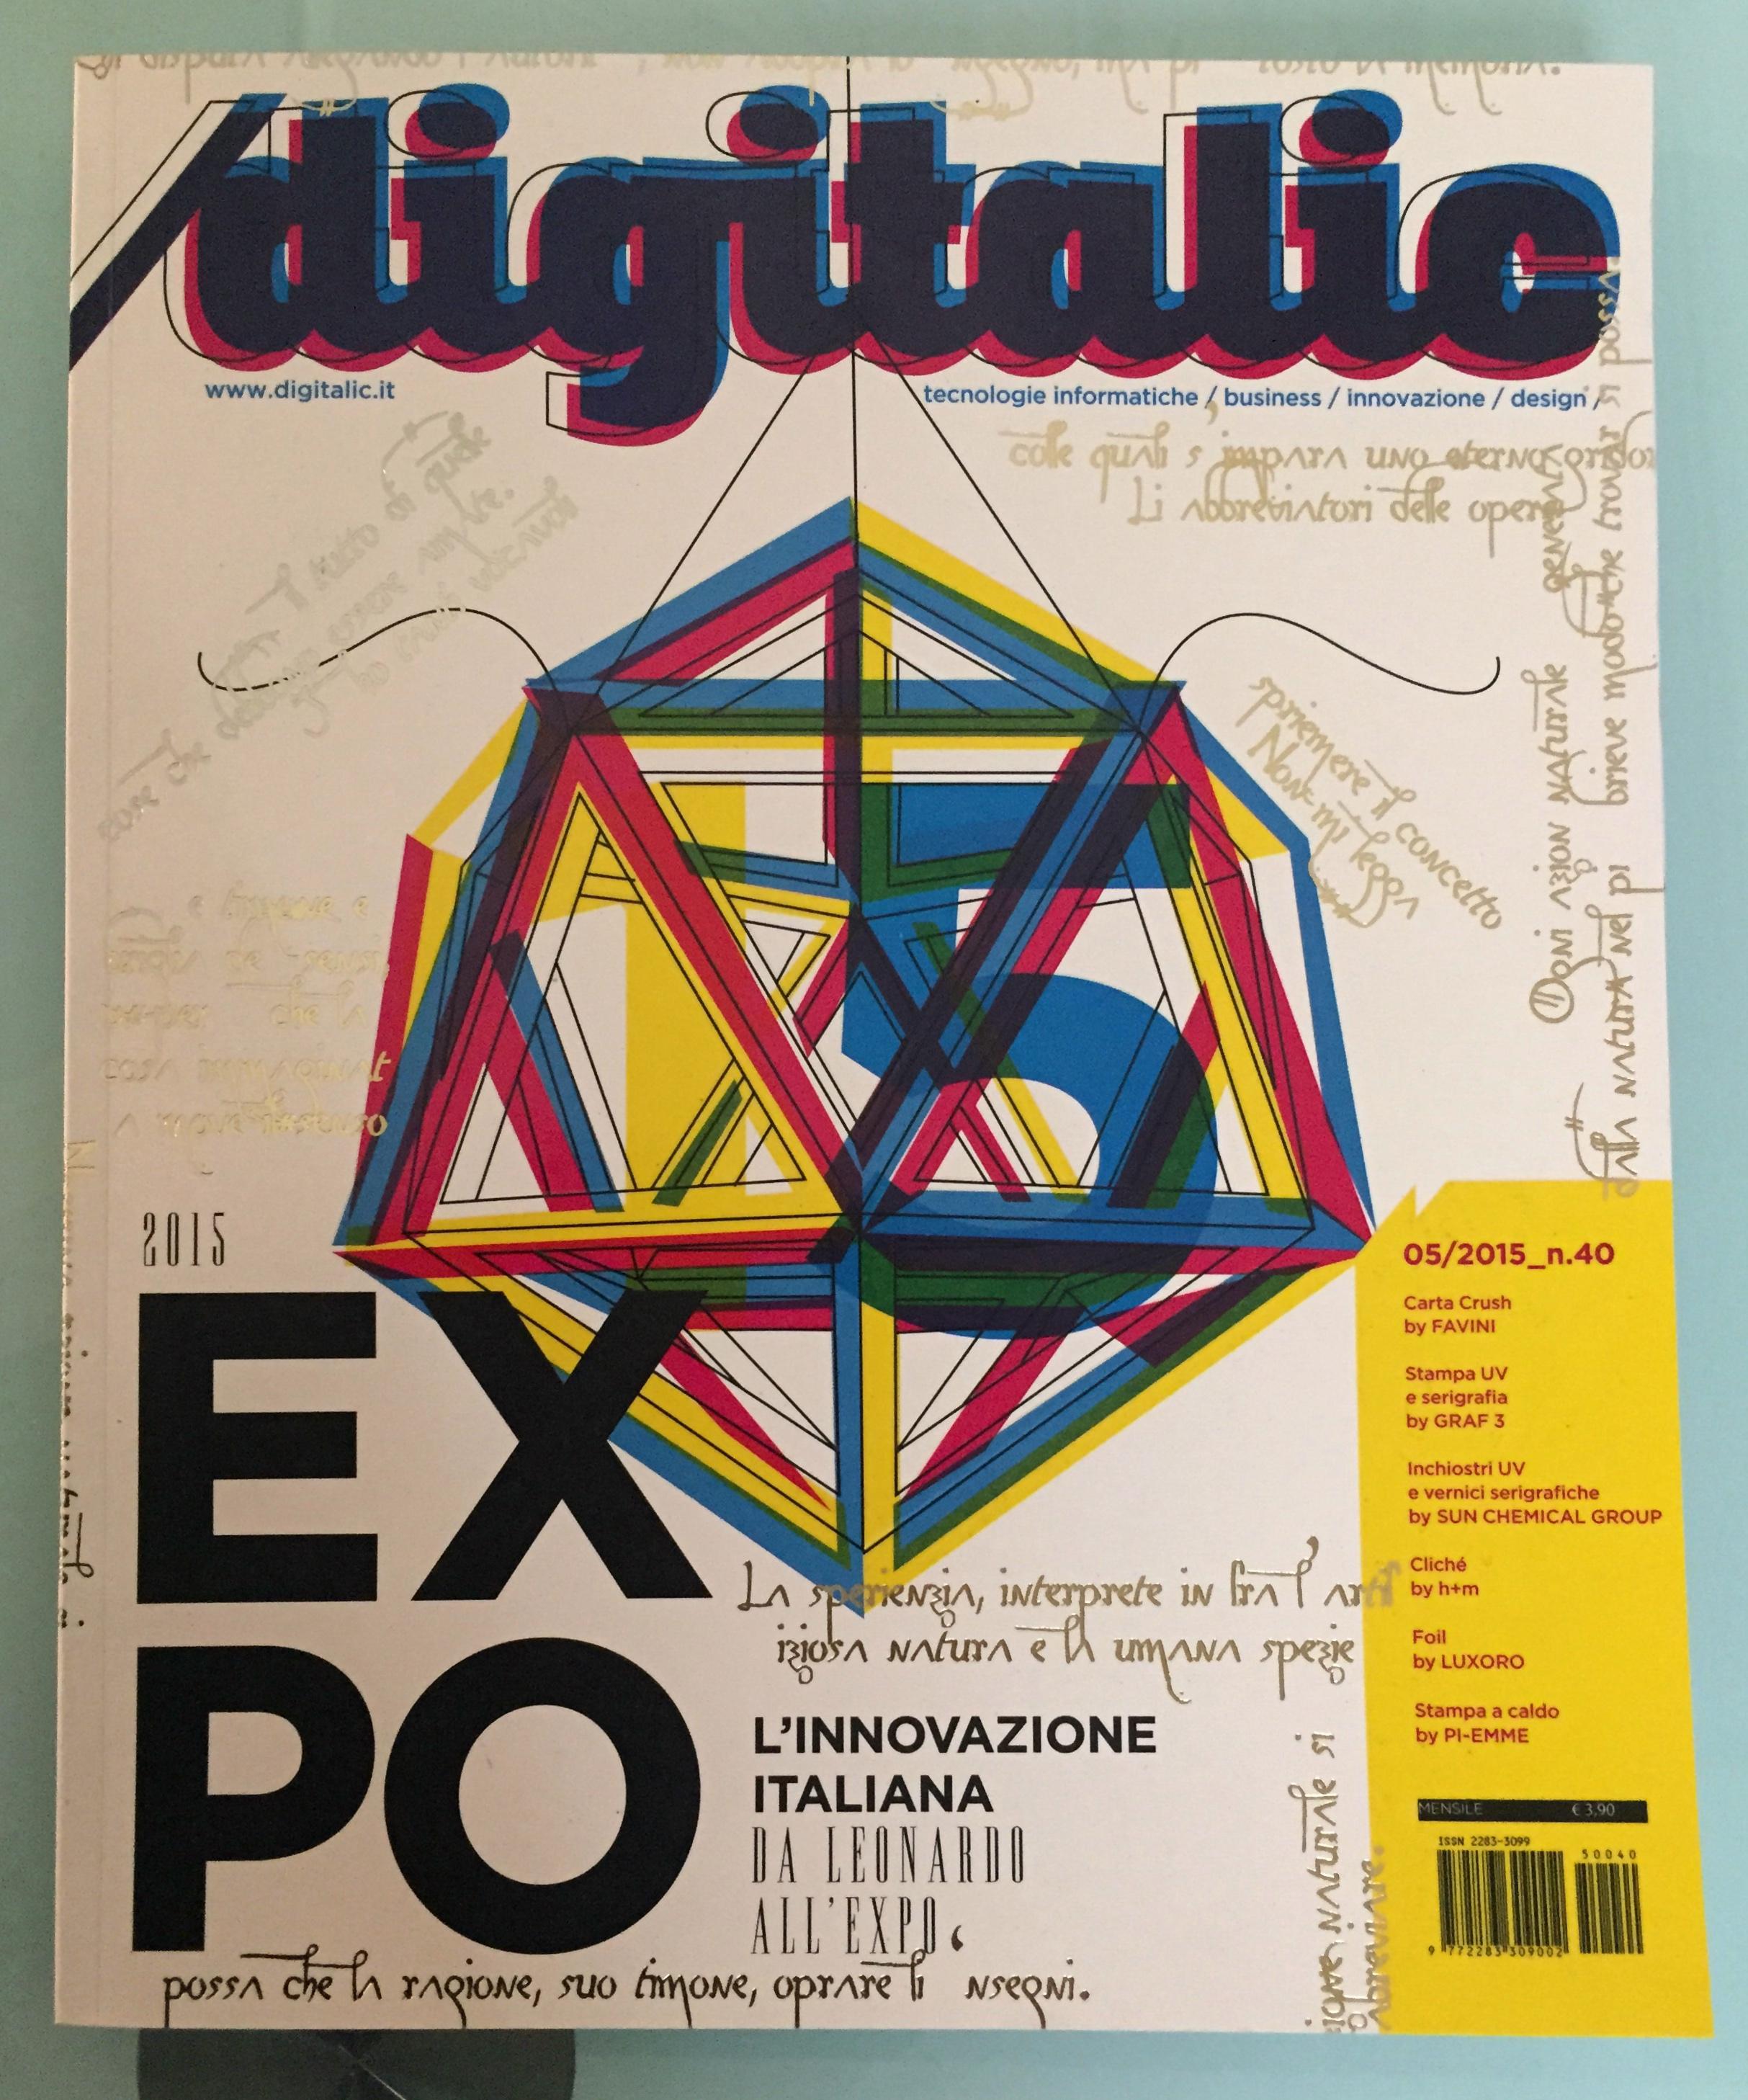 digitalic Expo